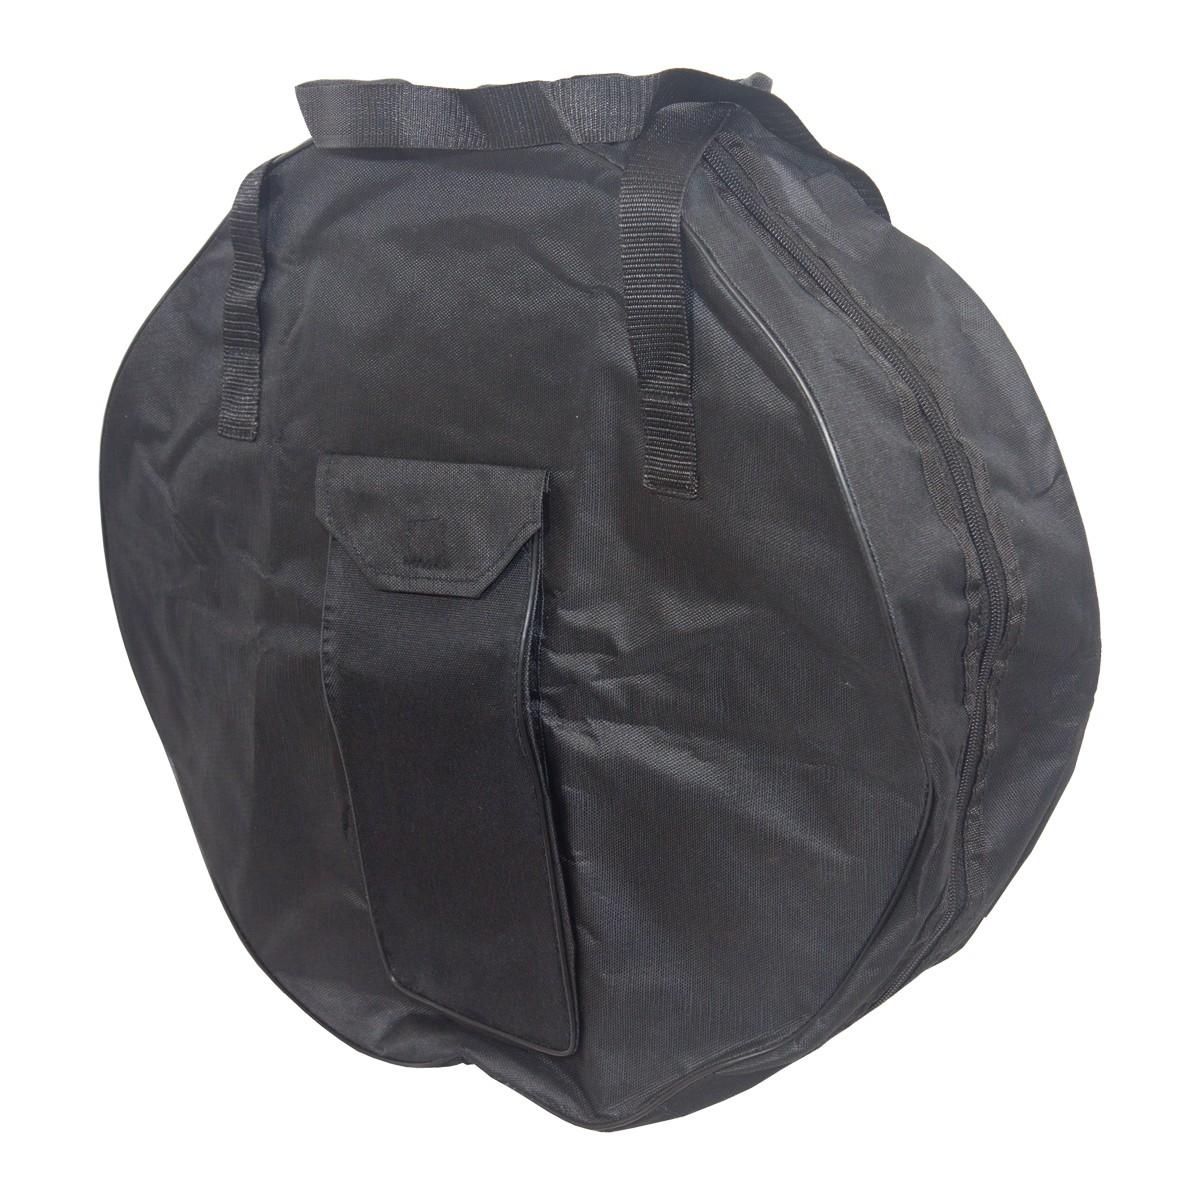 Roosebeck Economy Gig Bag for Bodhran 16'x 8'